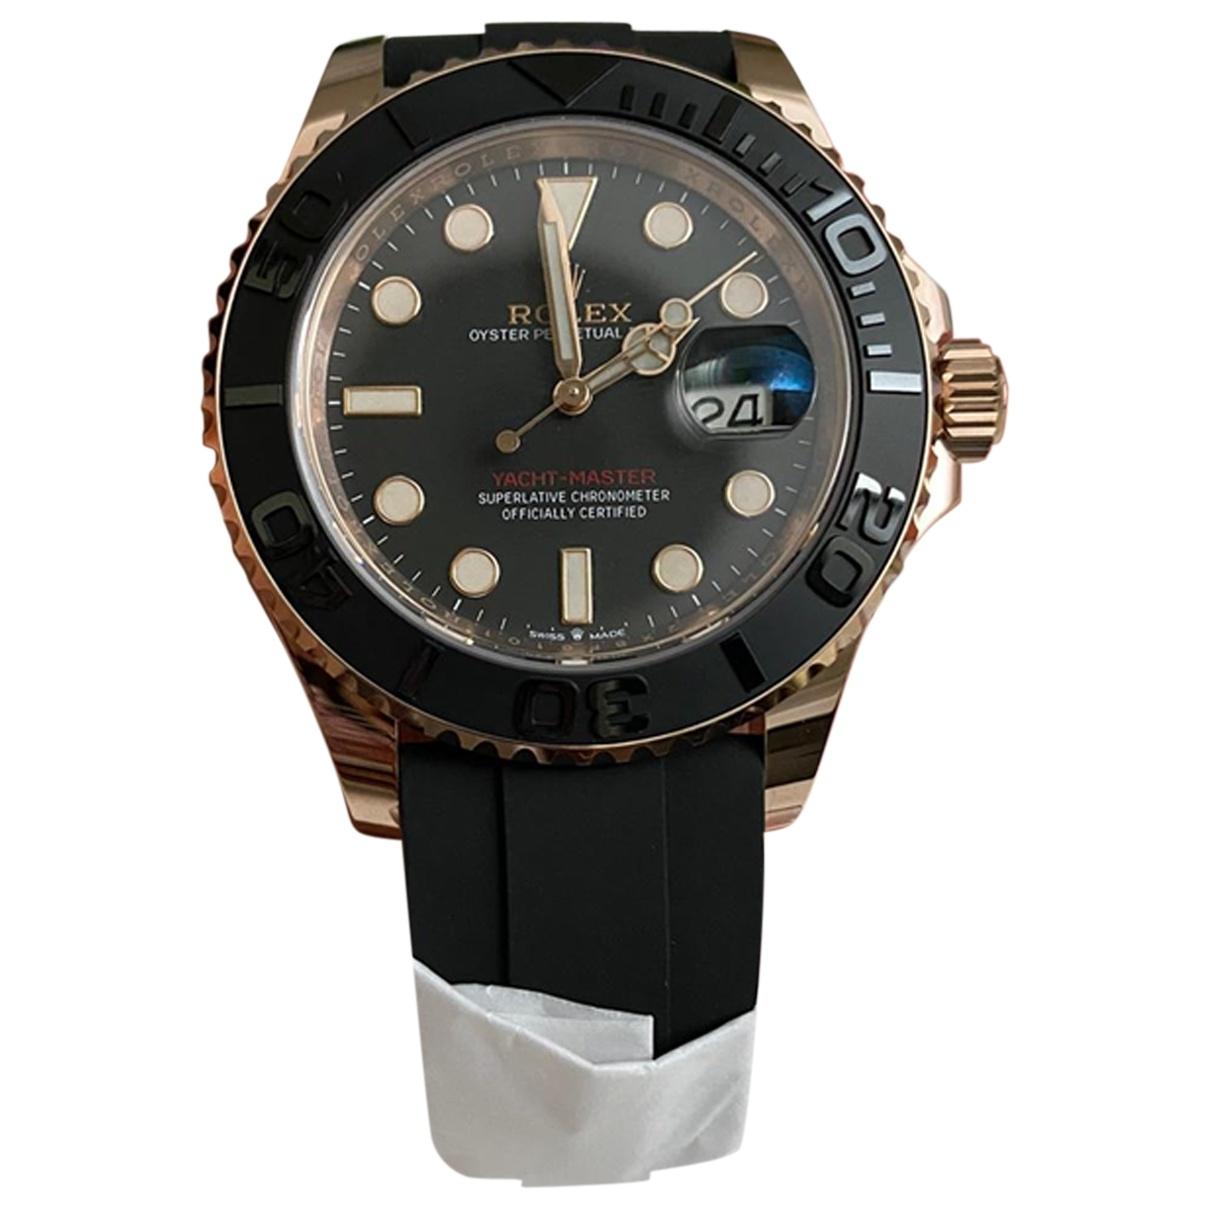 Relojes Yacht-Master de Oro rosa Rolex